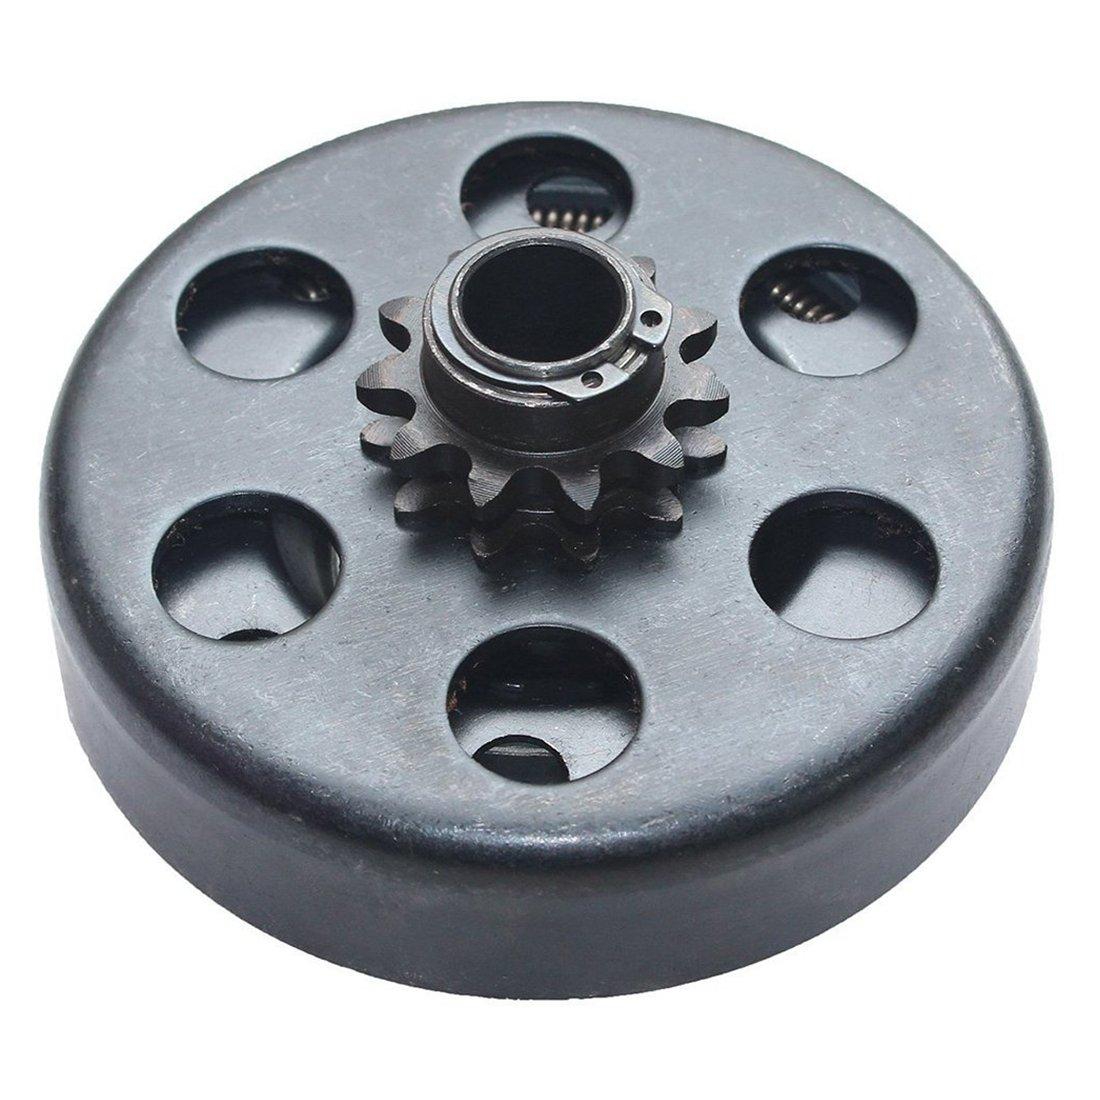 Woniu Centrifugal Clutch 5//8 Bore 11 Tooth 11T for Sprocket 35 Chain fit Go kart Baja Mini Bike 2.8HP and 97cc Engines